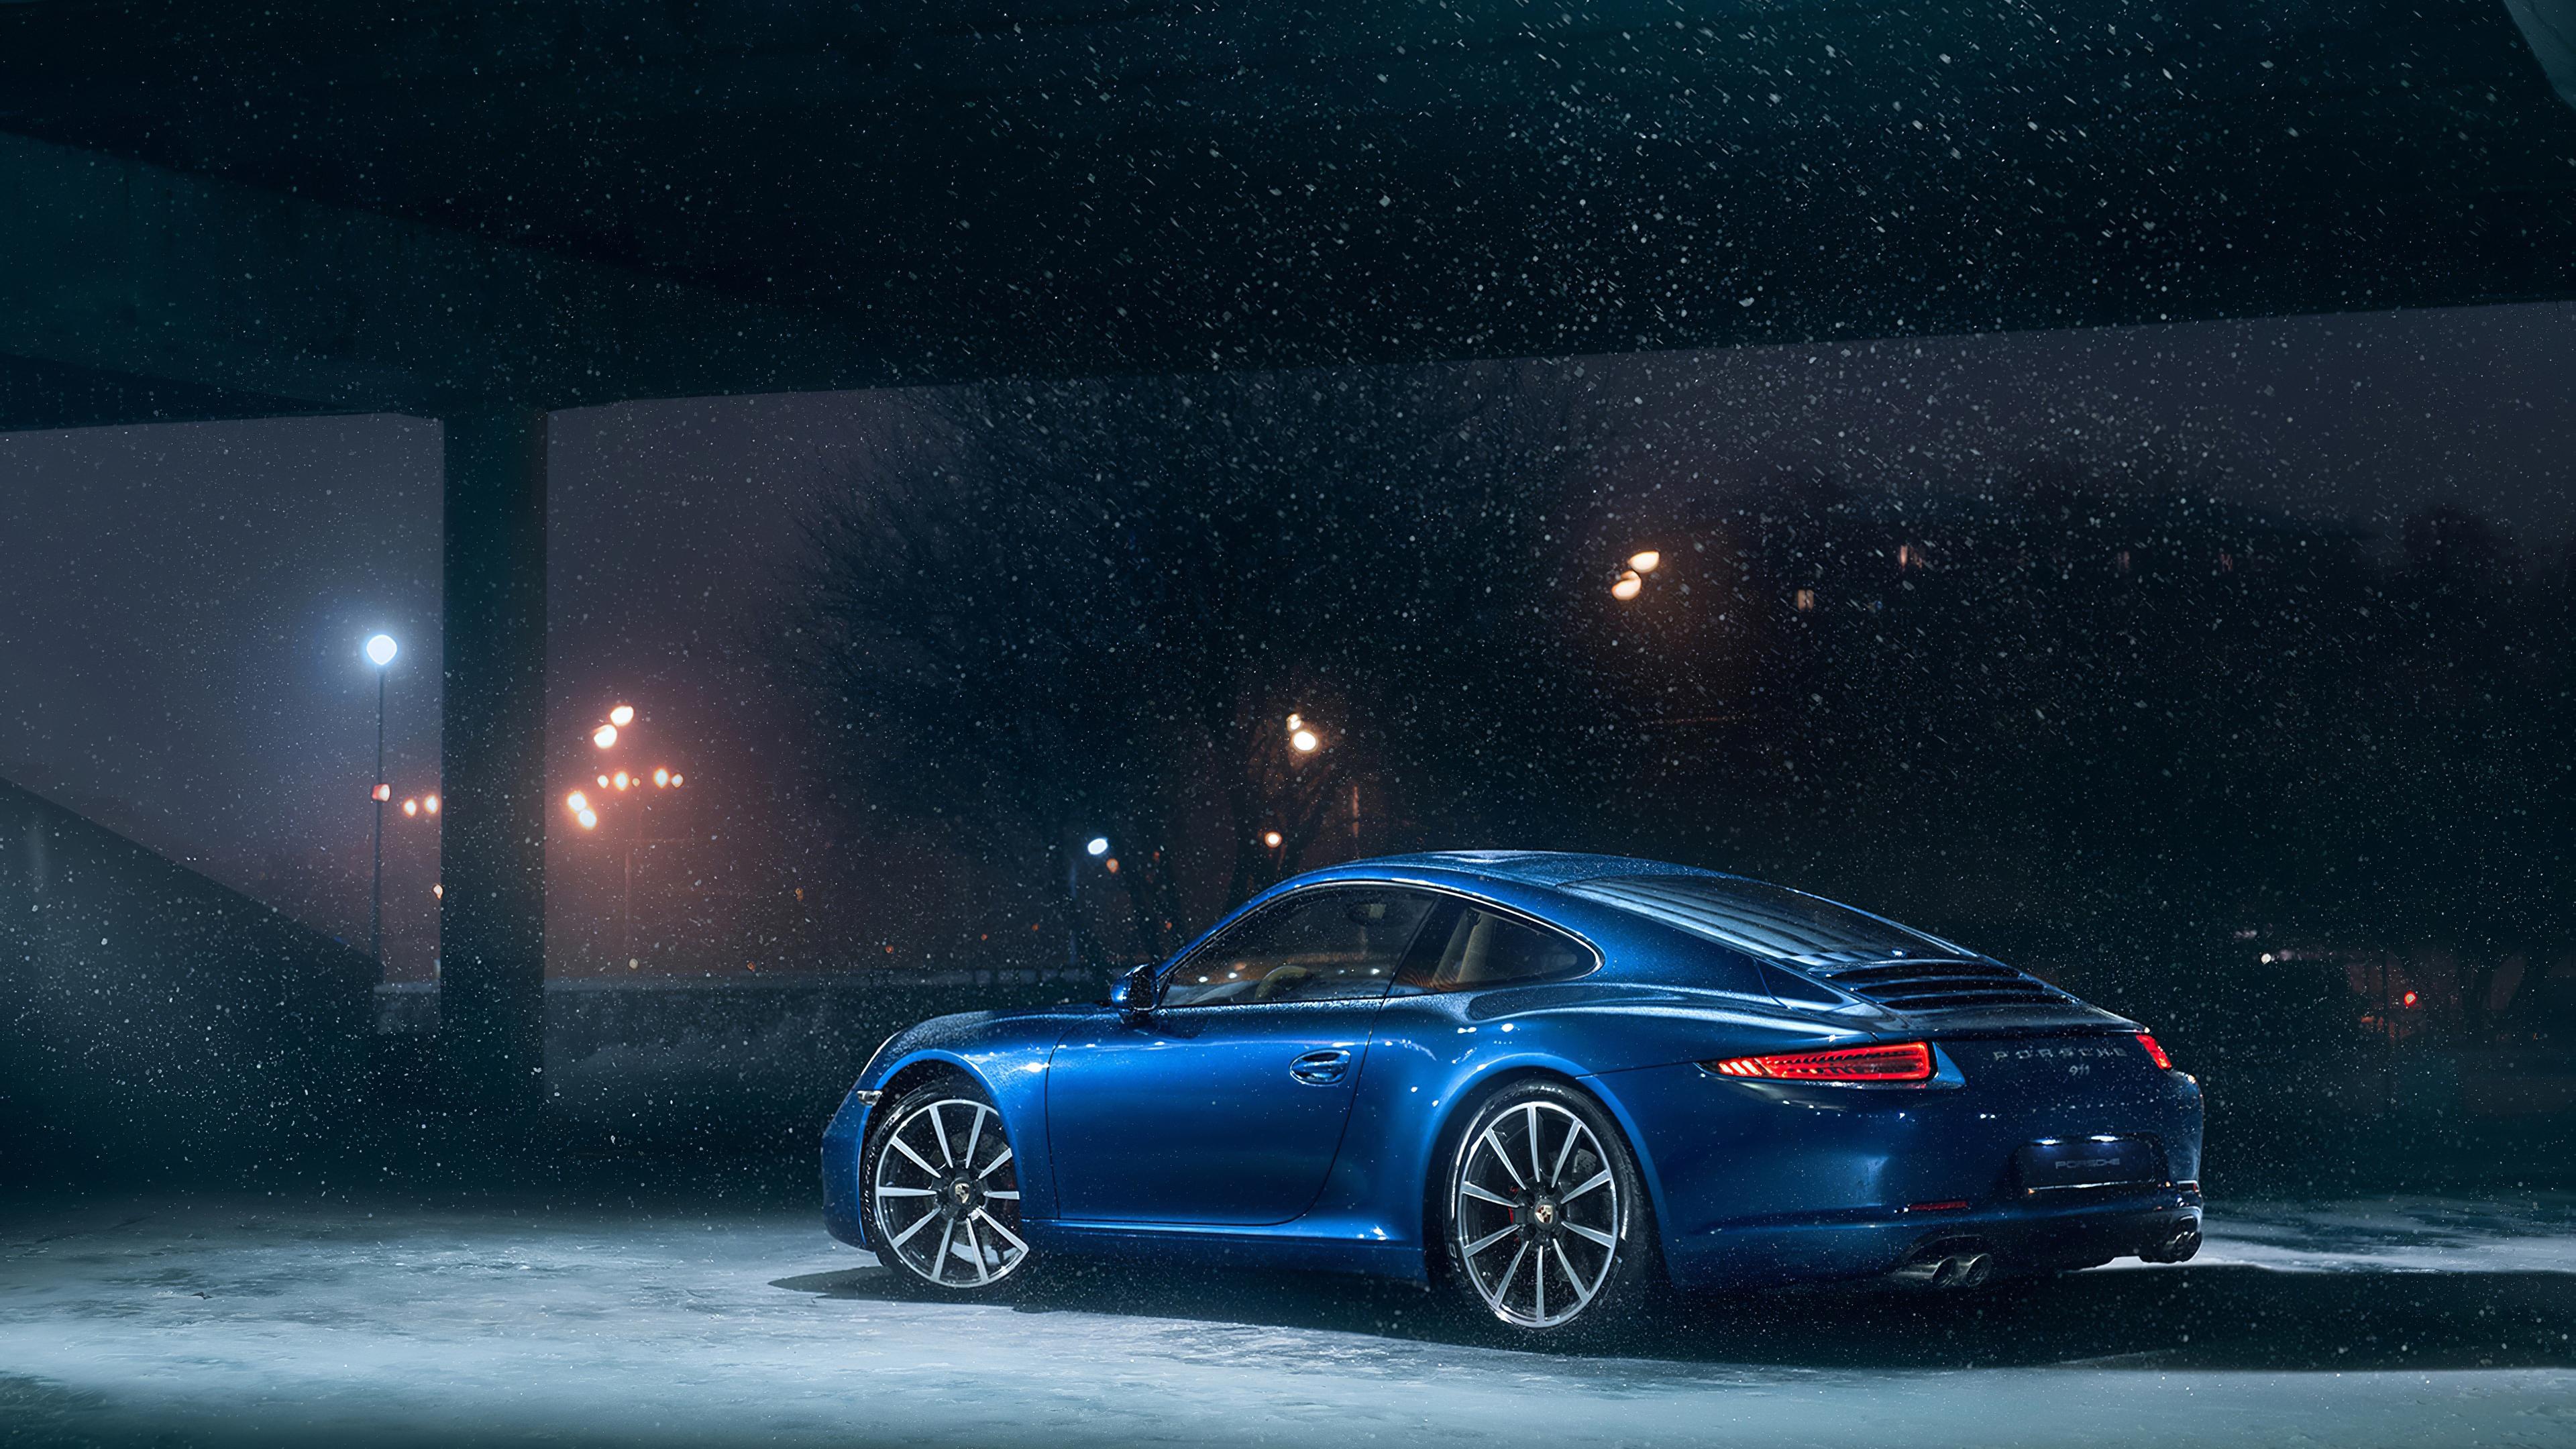 porsche 911 in snow 1577653837 - Porsche 911 In Snow - Posrche 911 In Snow 4k wallpaper